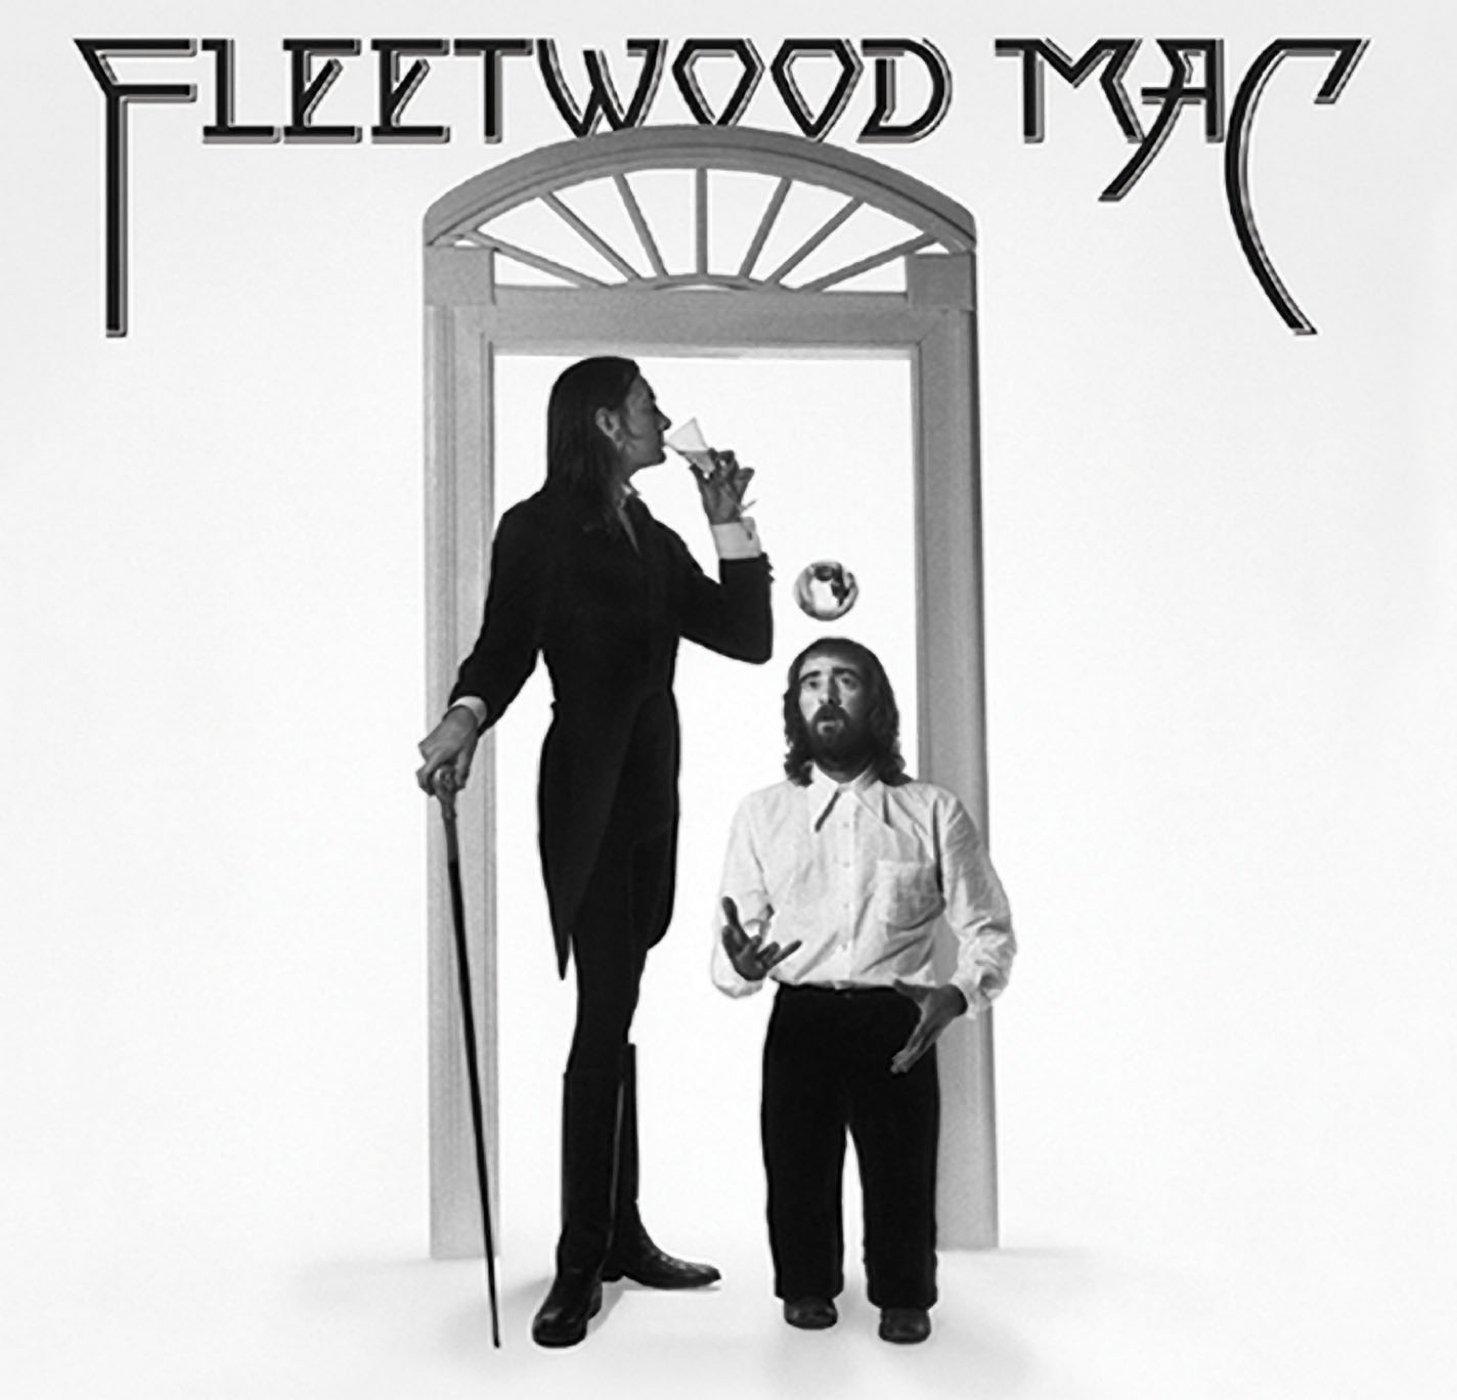 Fleetwood Mac - Fleetwood Mac (Deluxe Edition) - Amazon.com Music